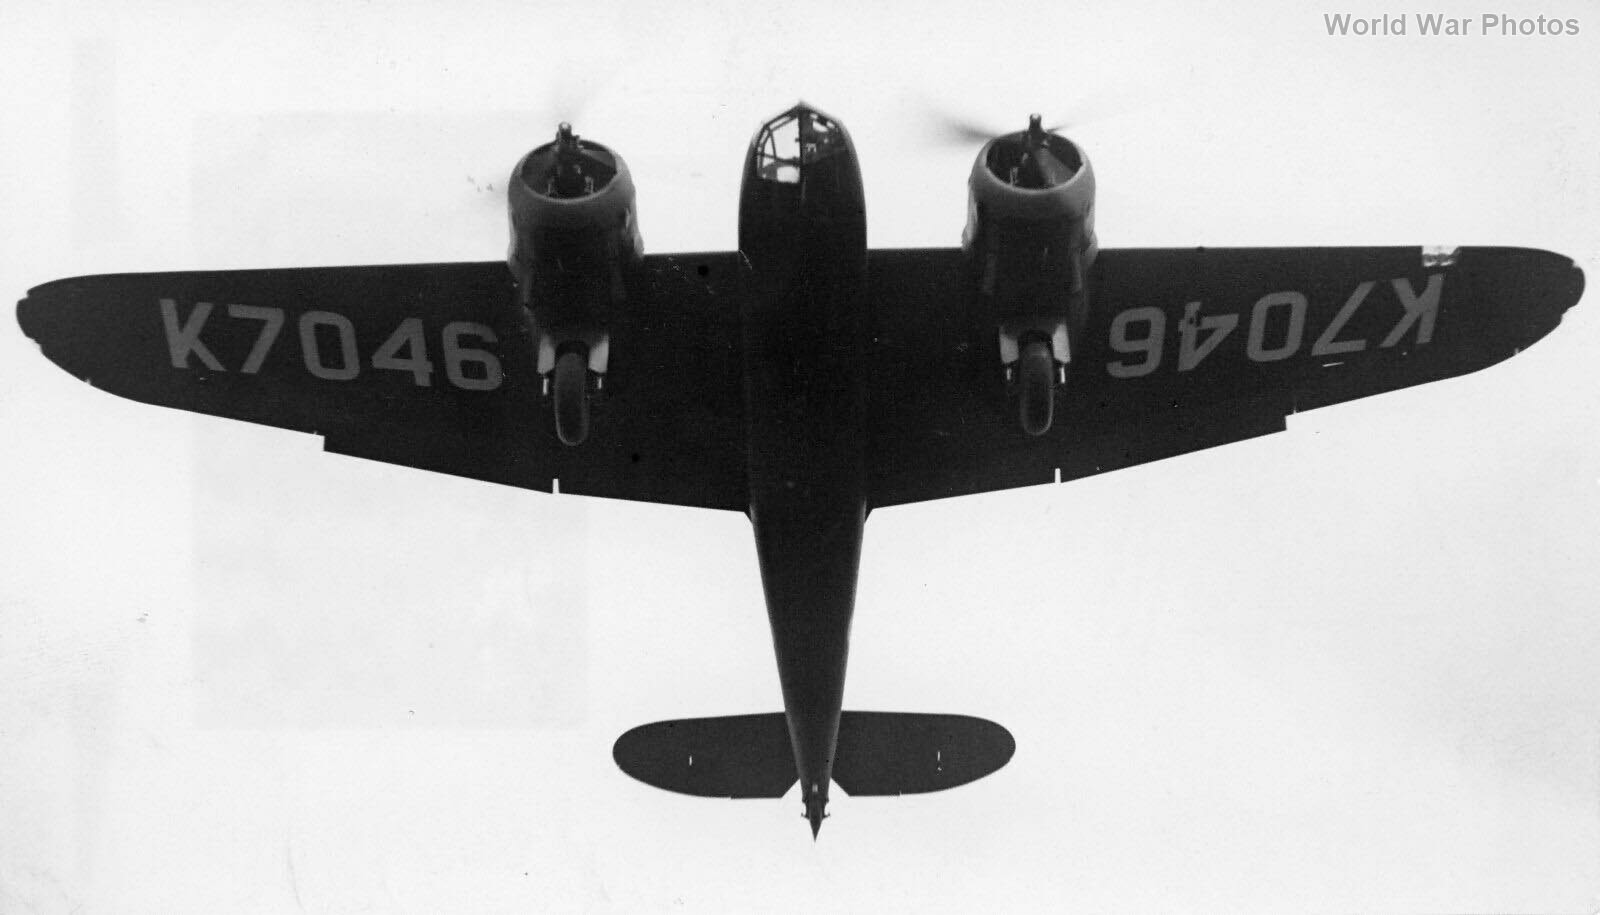 Blenheim K7046 114 Sqn Wyton 1937